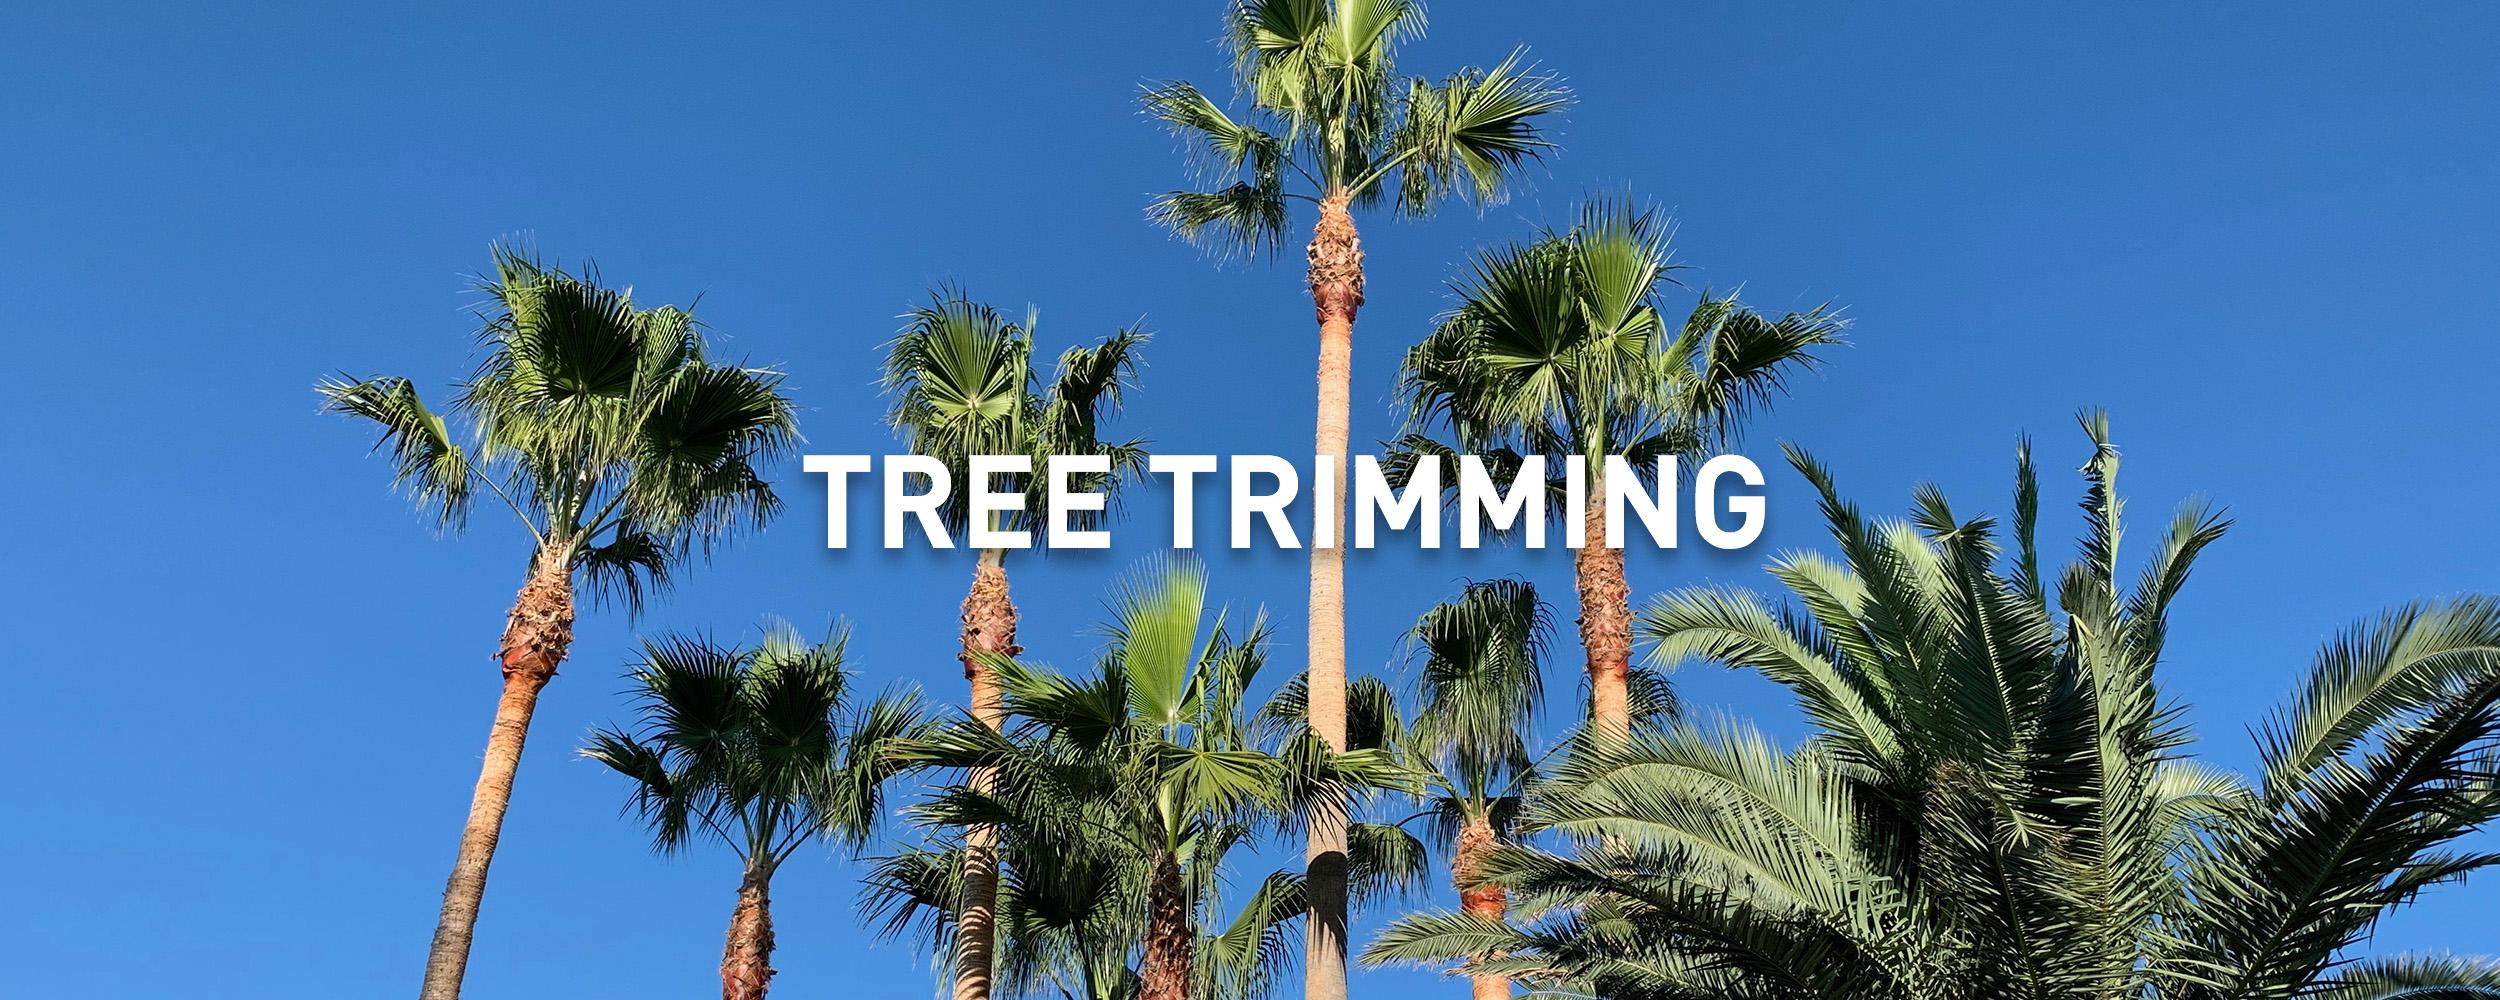 TREETRIMMING_2500.jpg